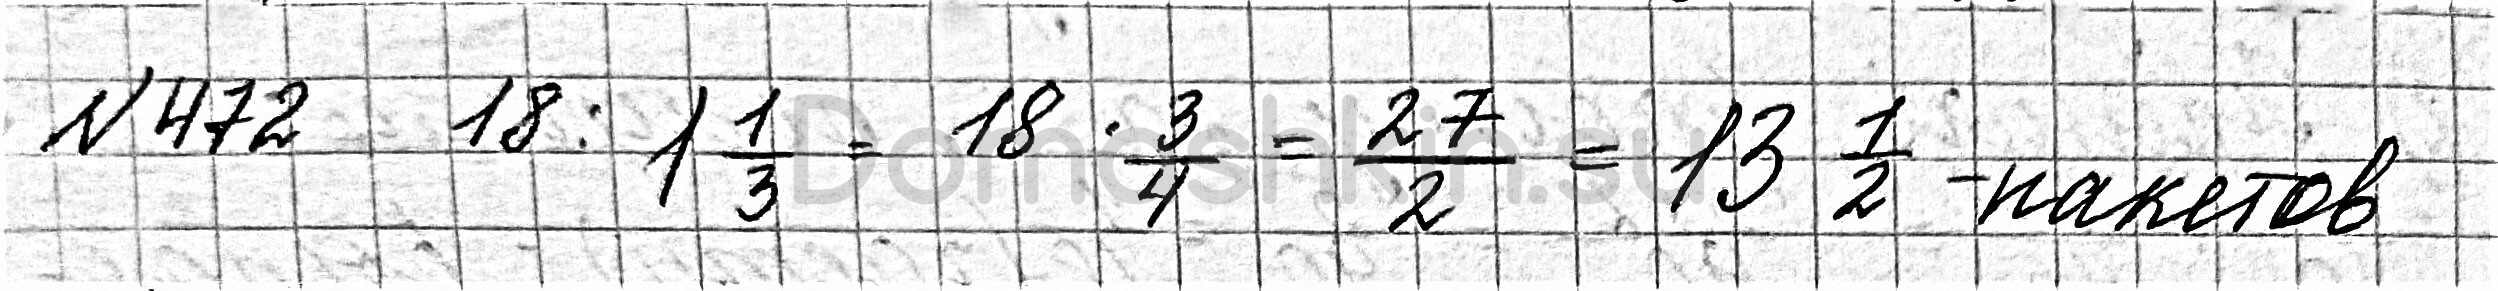 Математика 6 класс учебник Мерзляк номер 472 решение